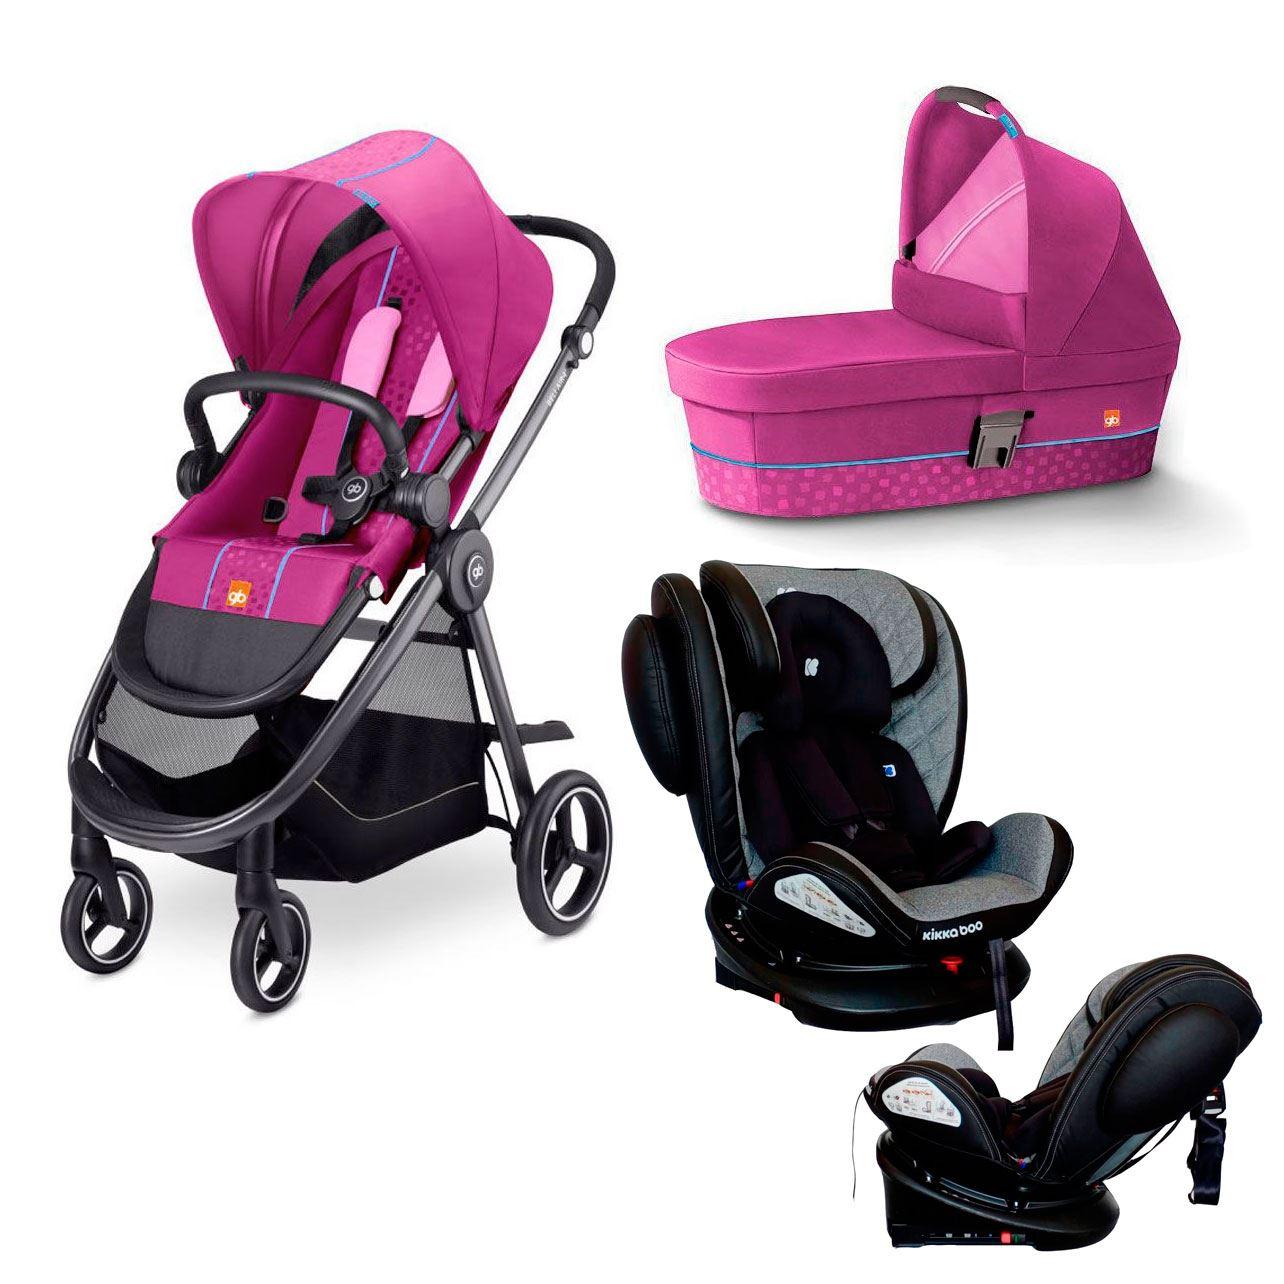 Pack coche de bebe Beli Air 4 de GB Posh Pink y silla stark